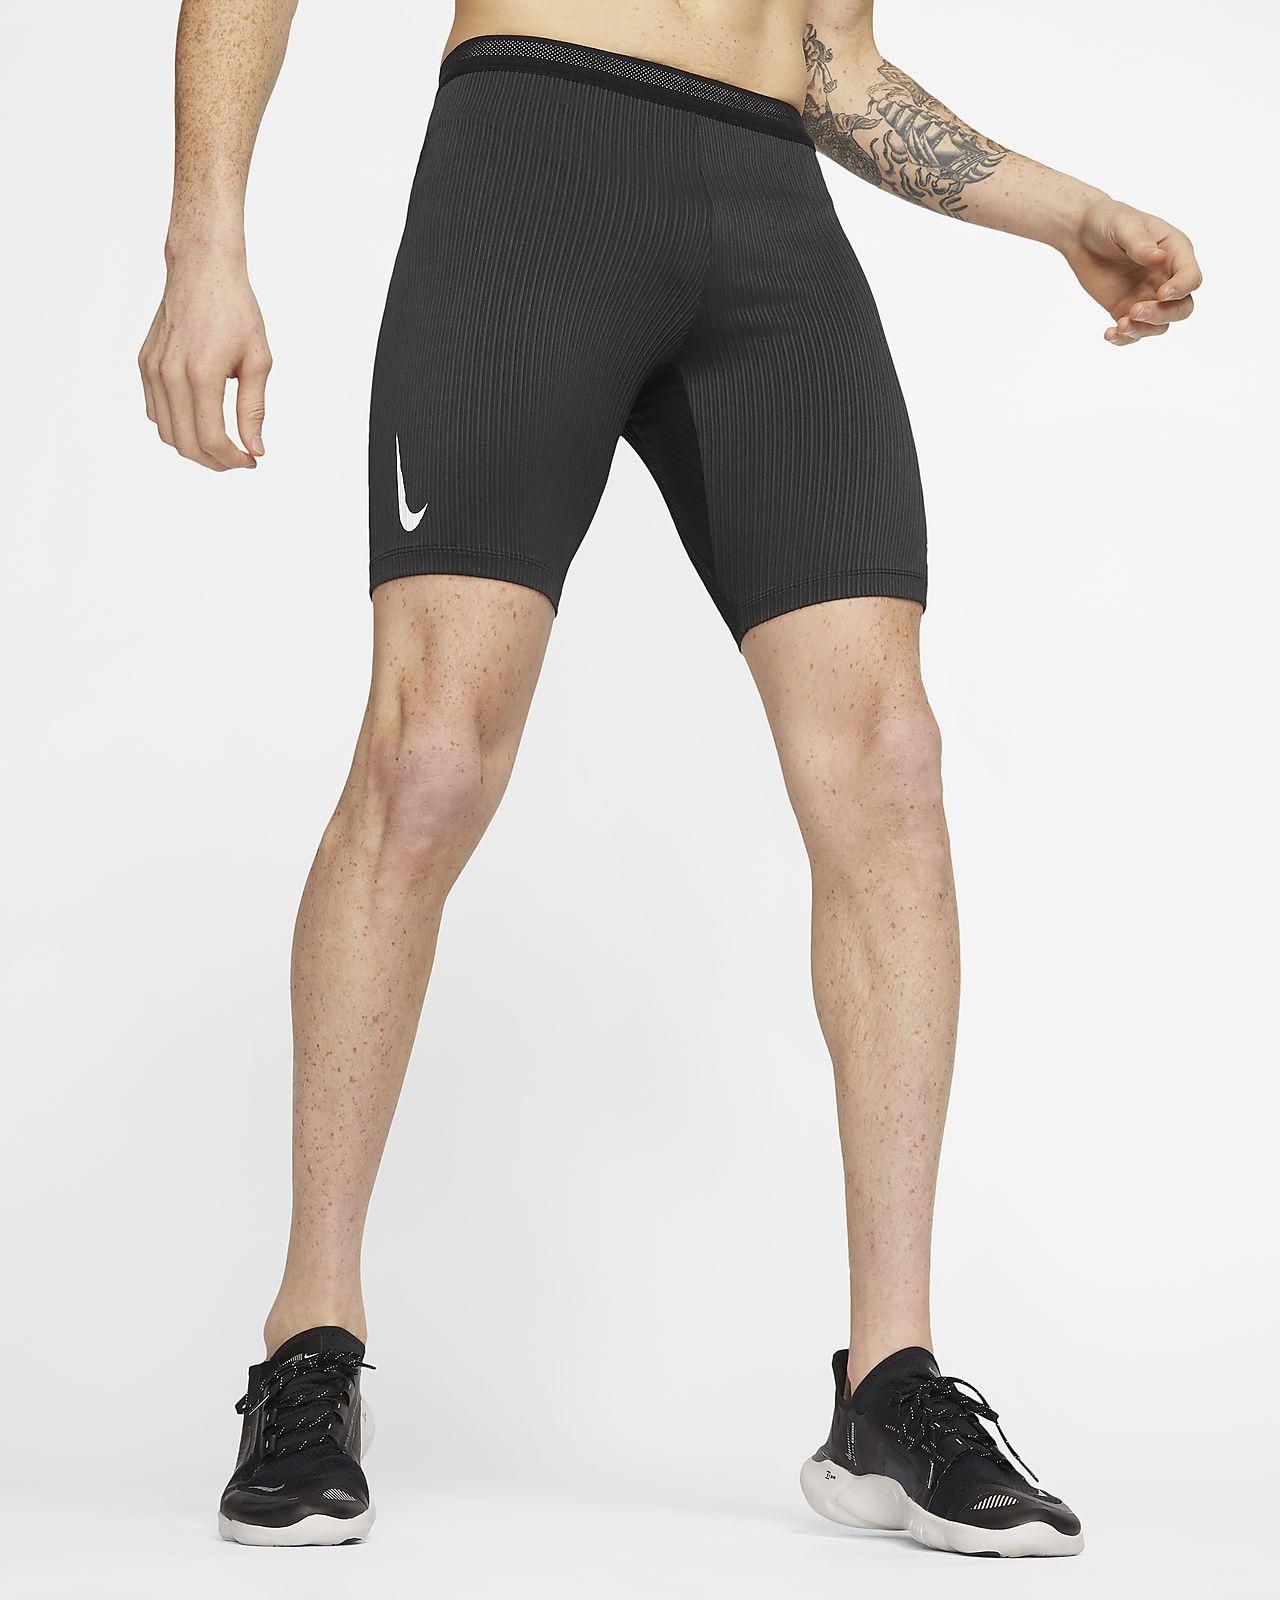 Nike AeroSwift Mallas de running de 1/2 - Hombre